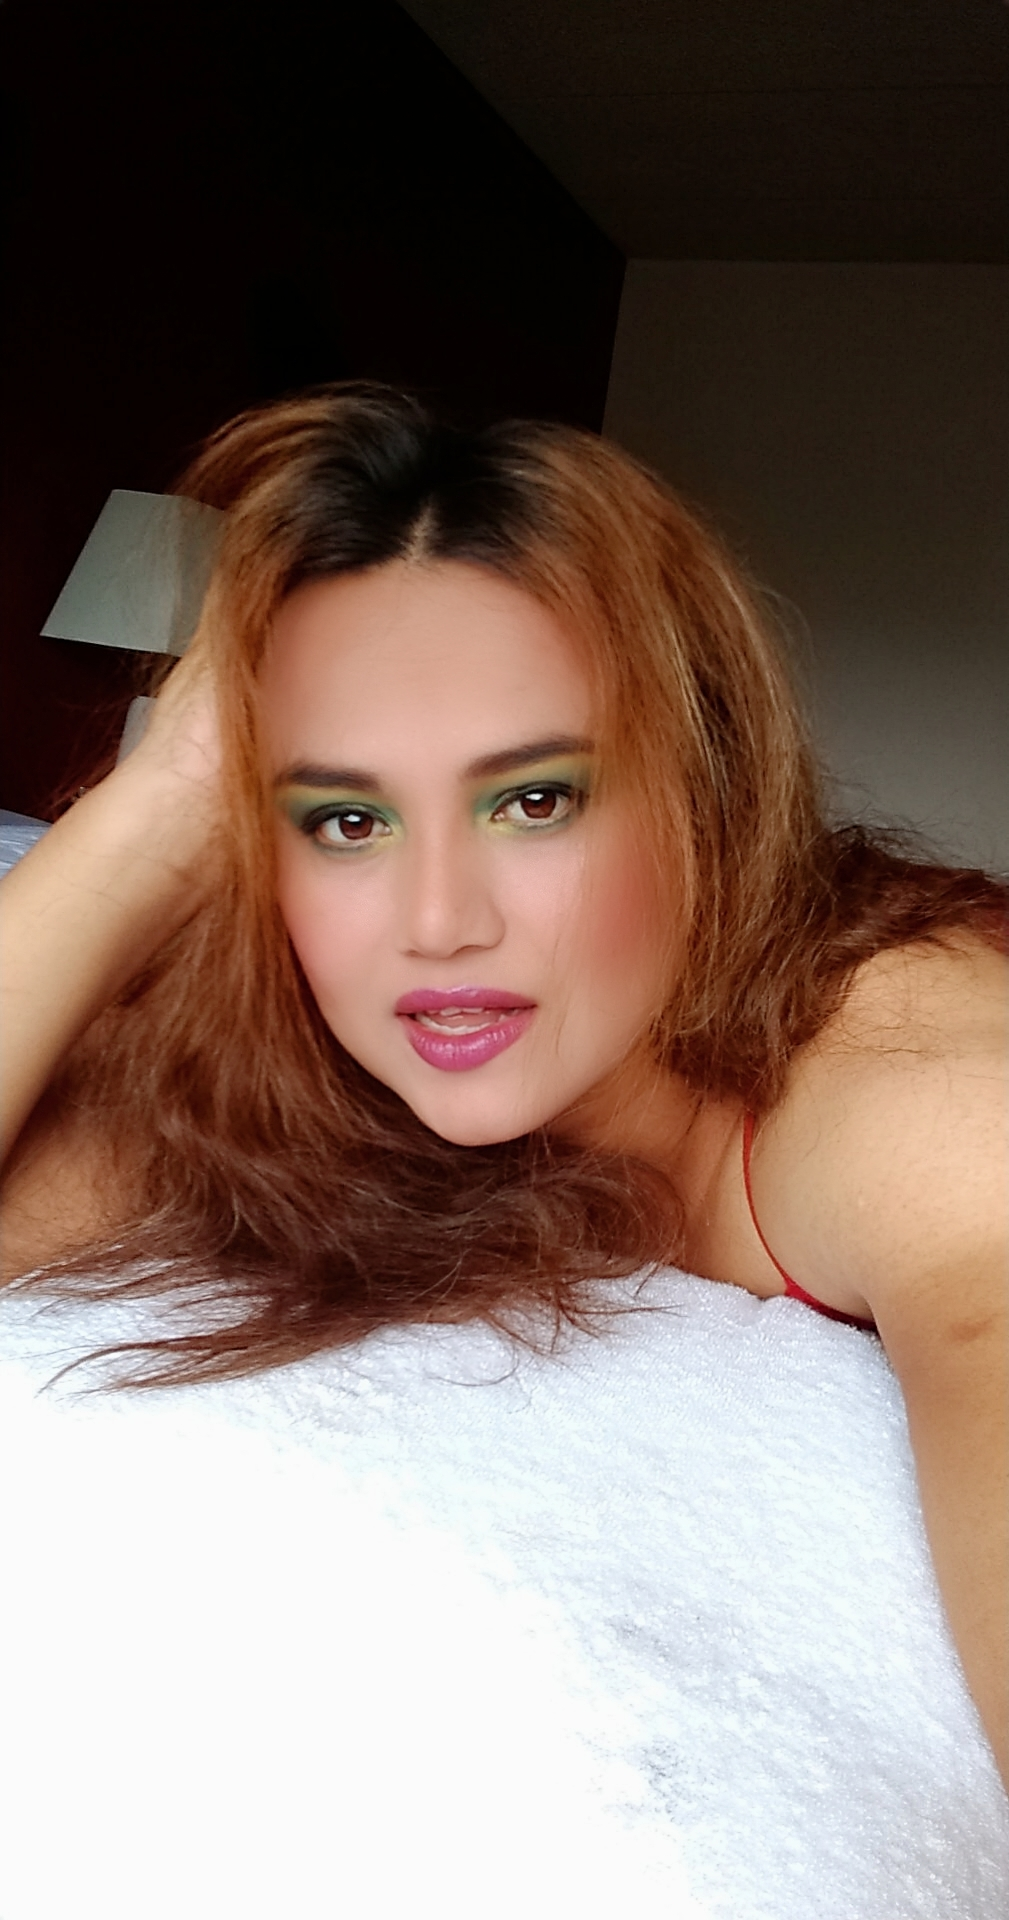 Selena Profile, Escort in New York City, 2023909171